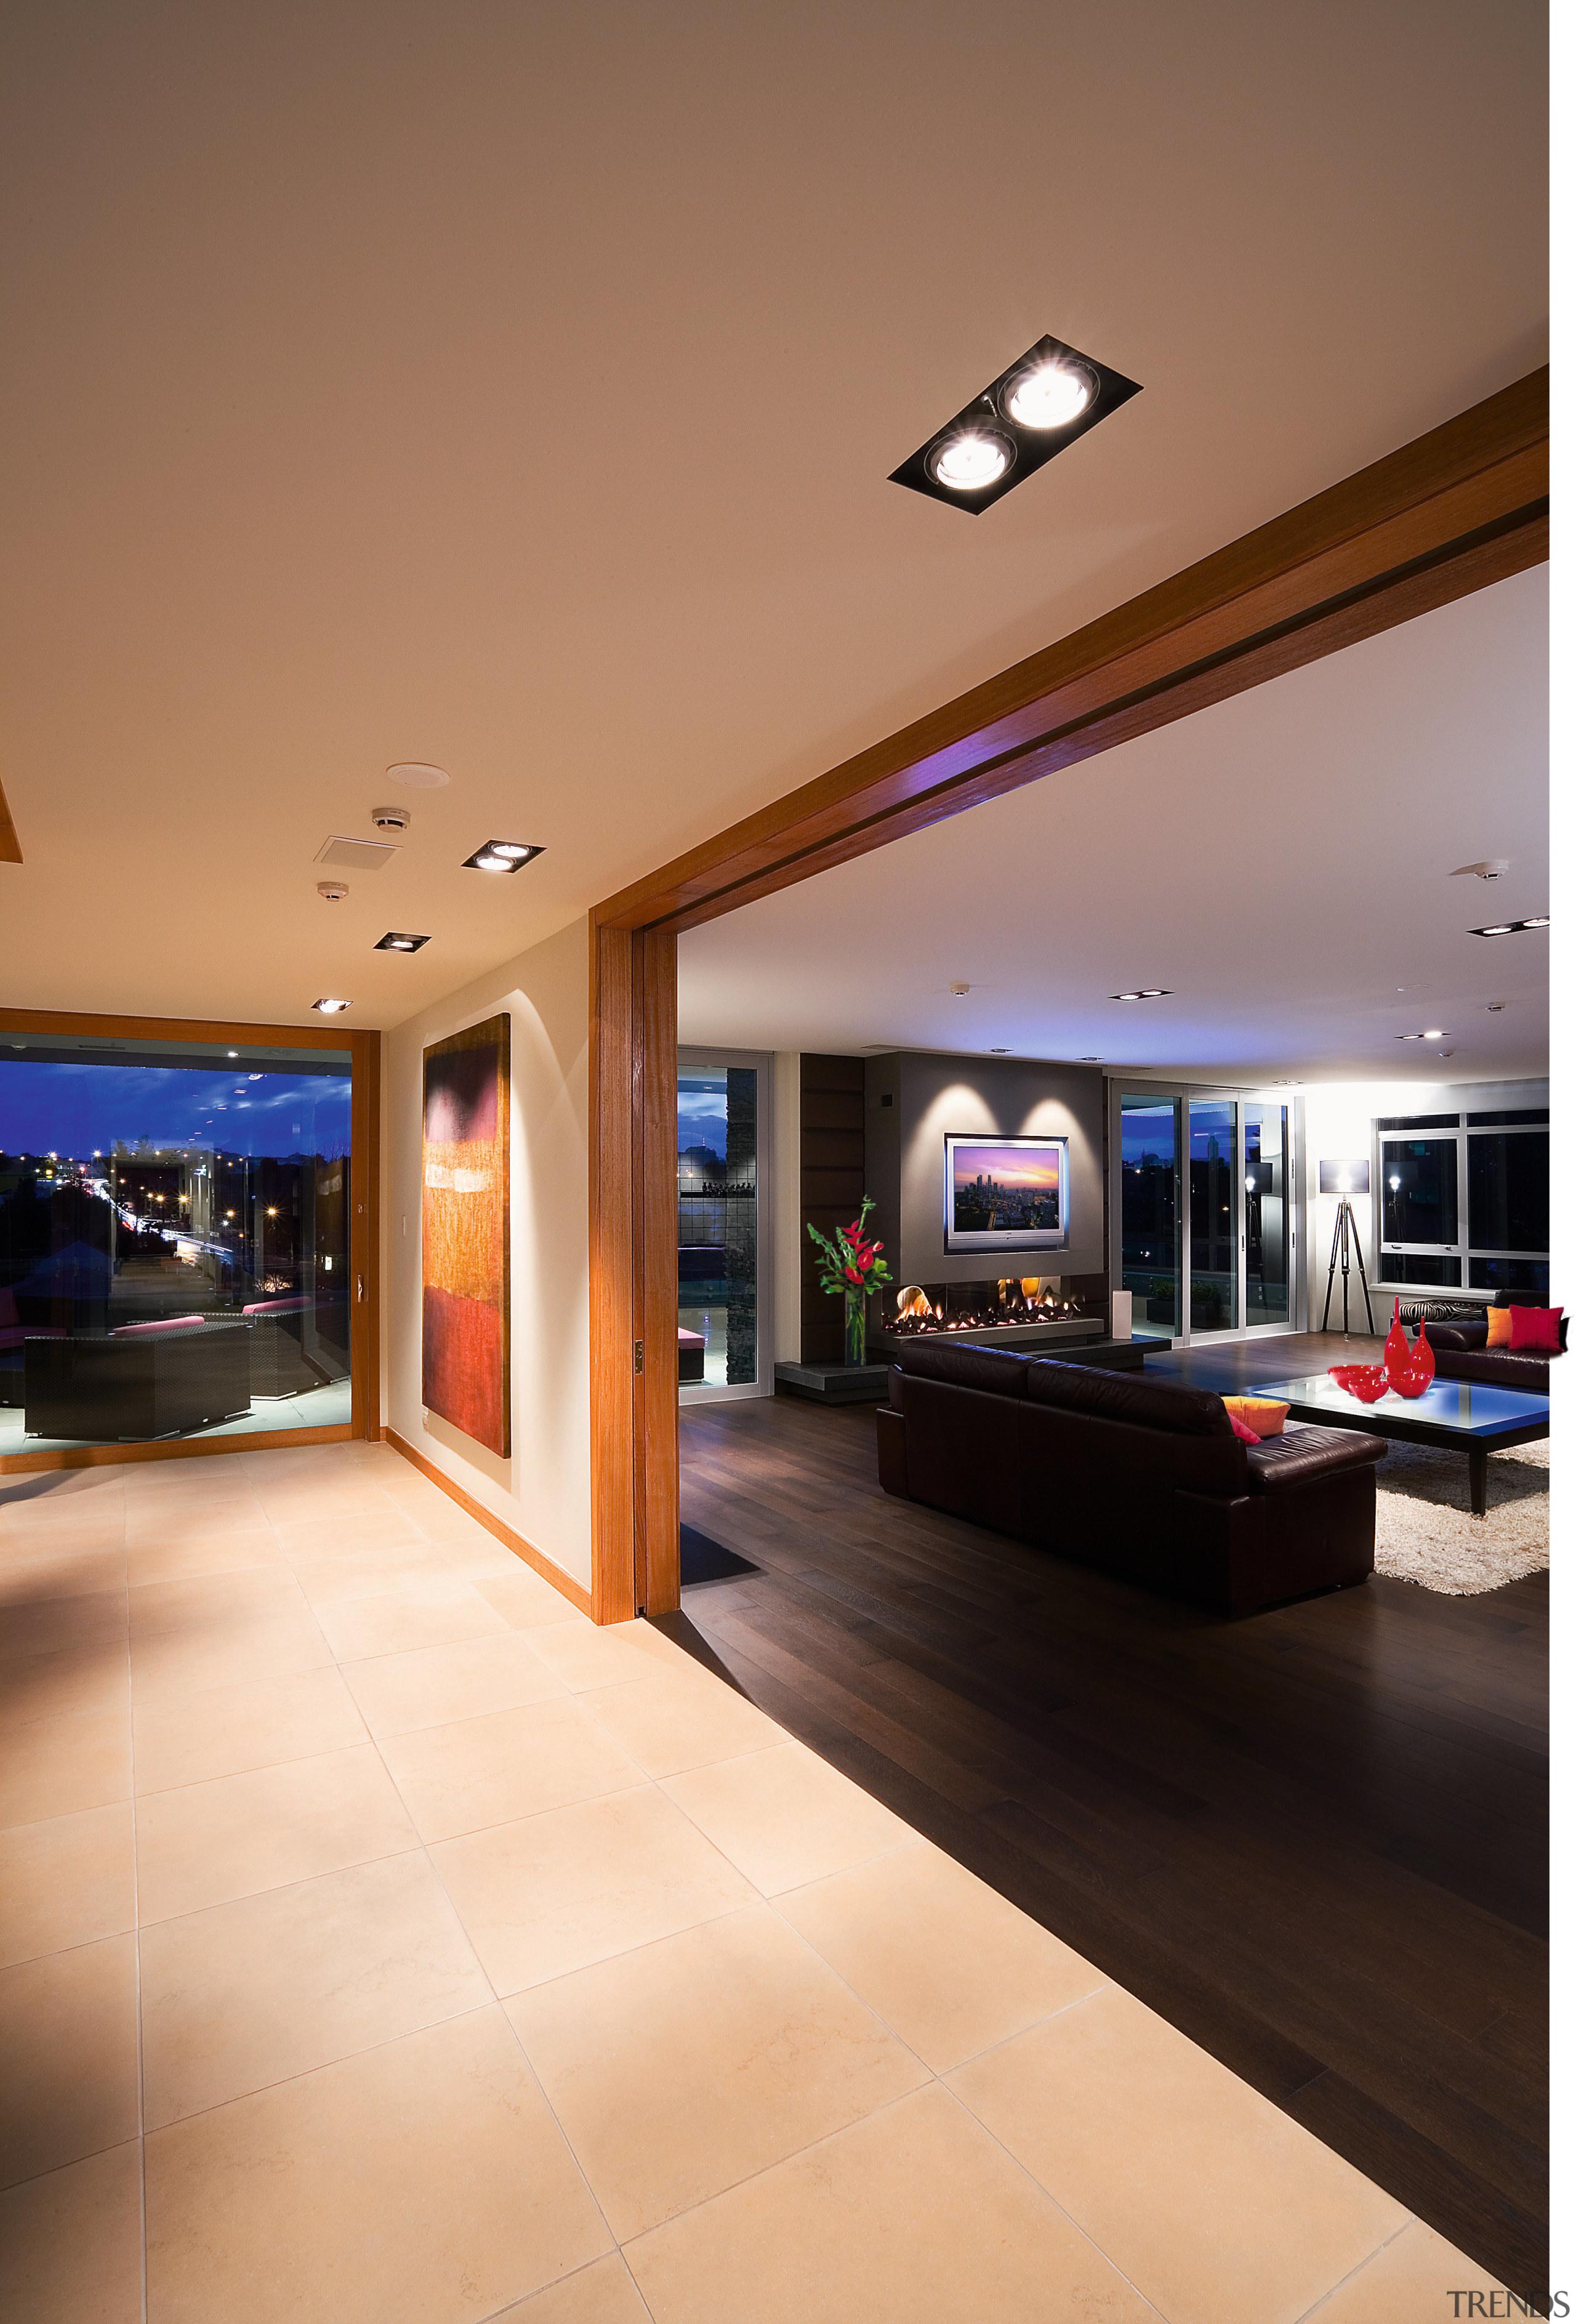 High end apartment.  Inner-city apartments. - High ceiling, floor, flooring, interior design, lighting, lobby, brown, orange